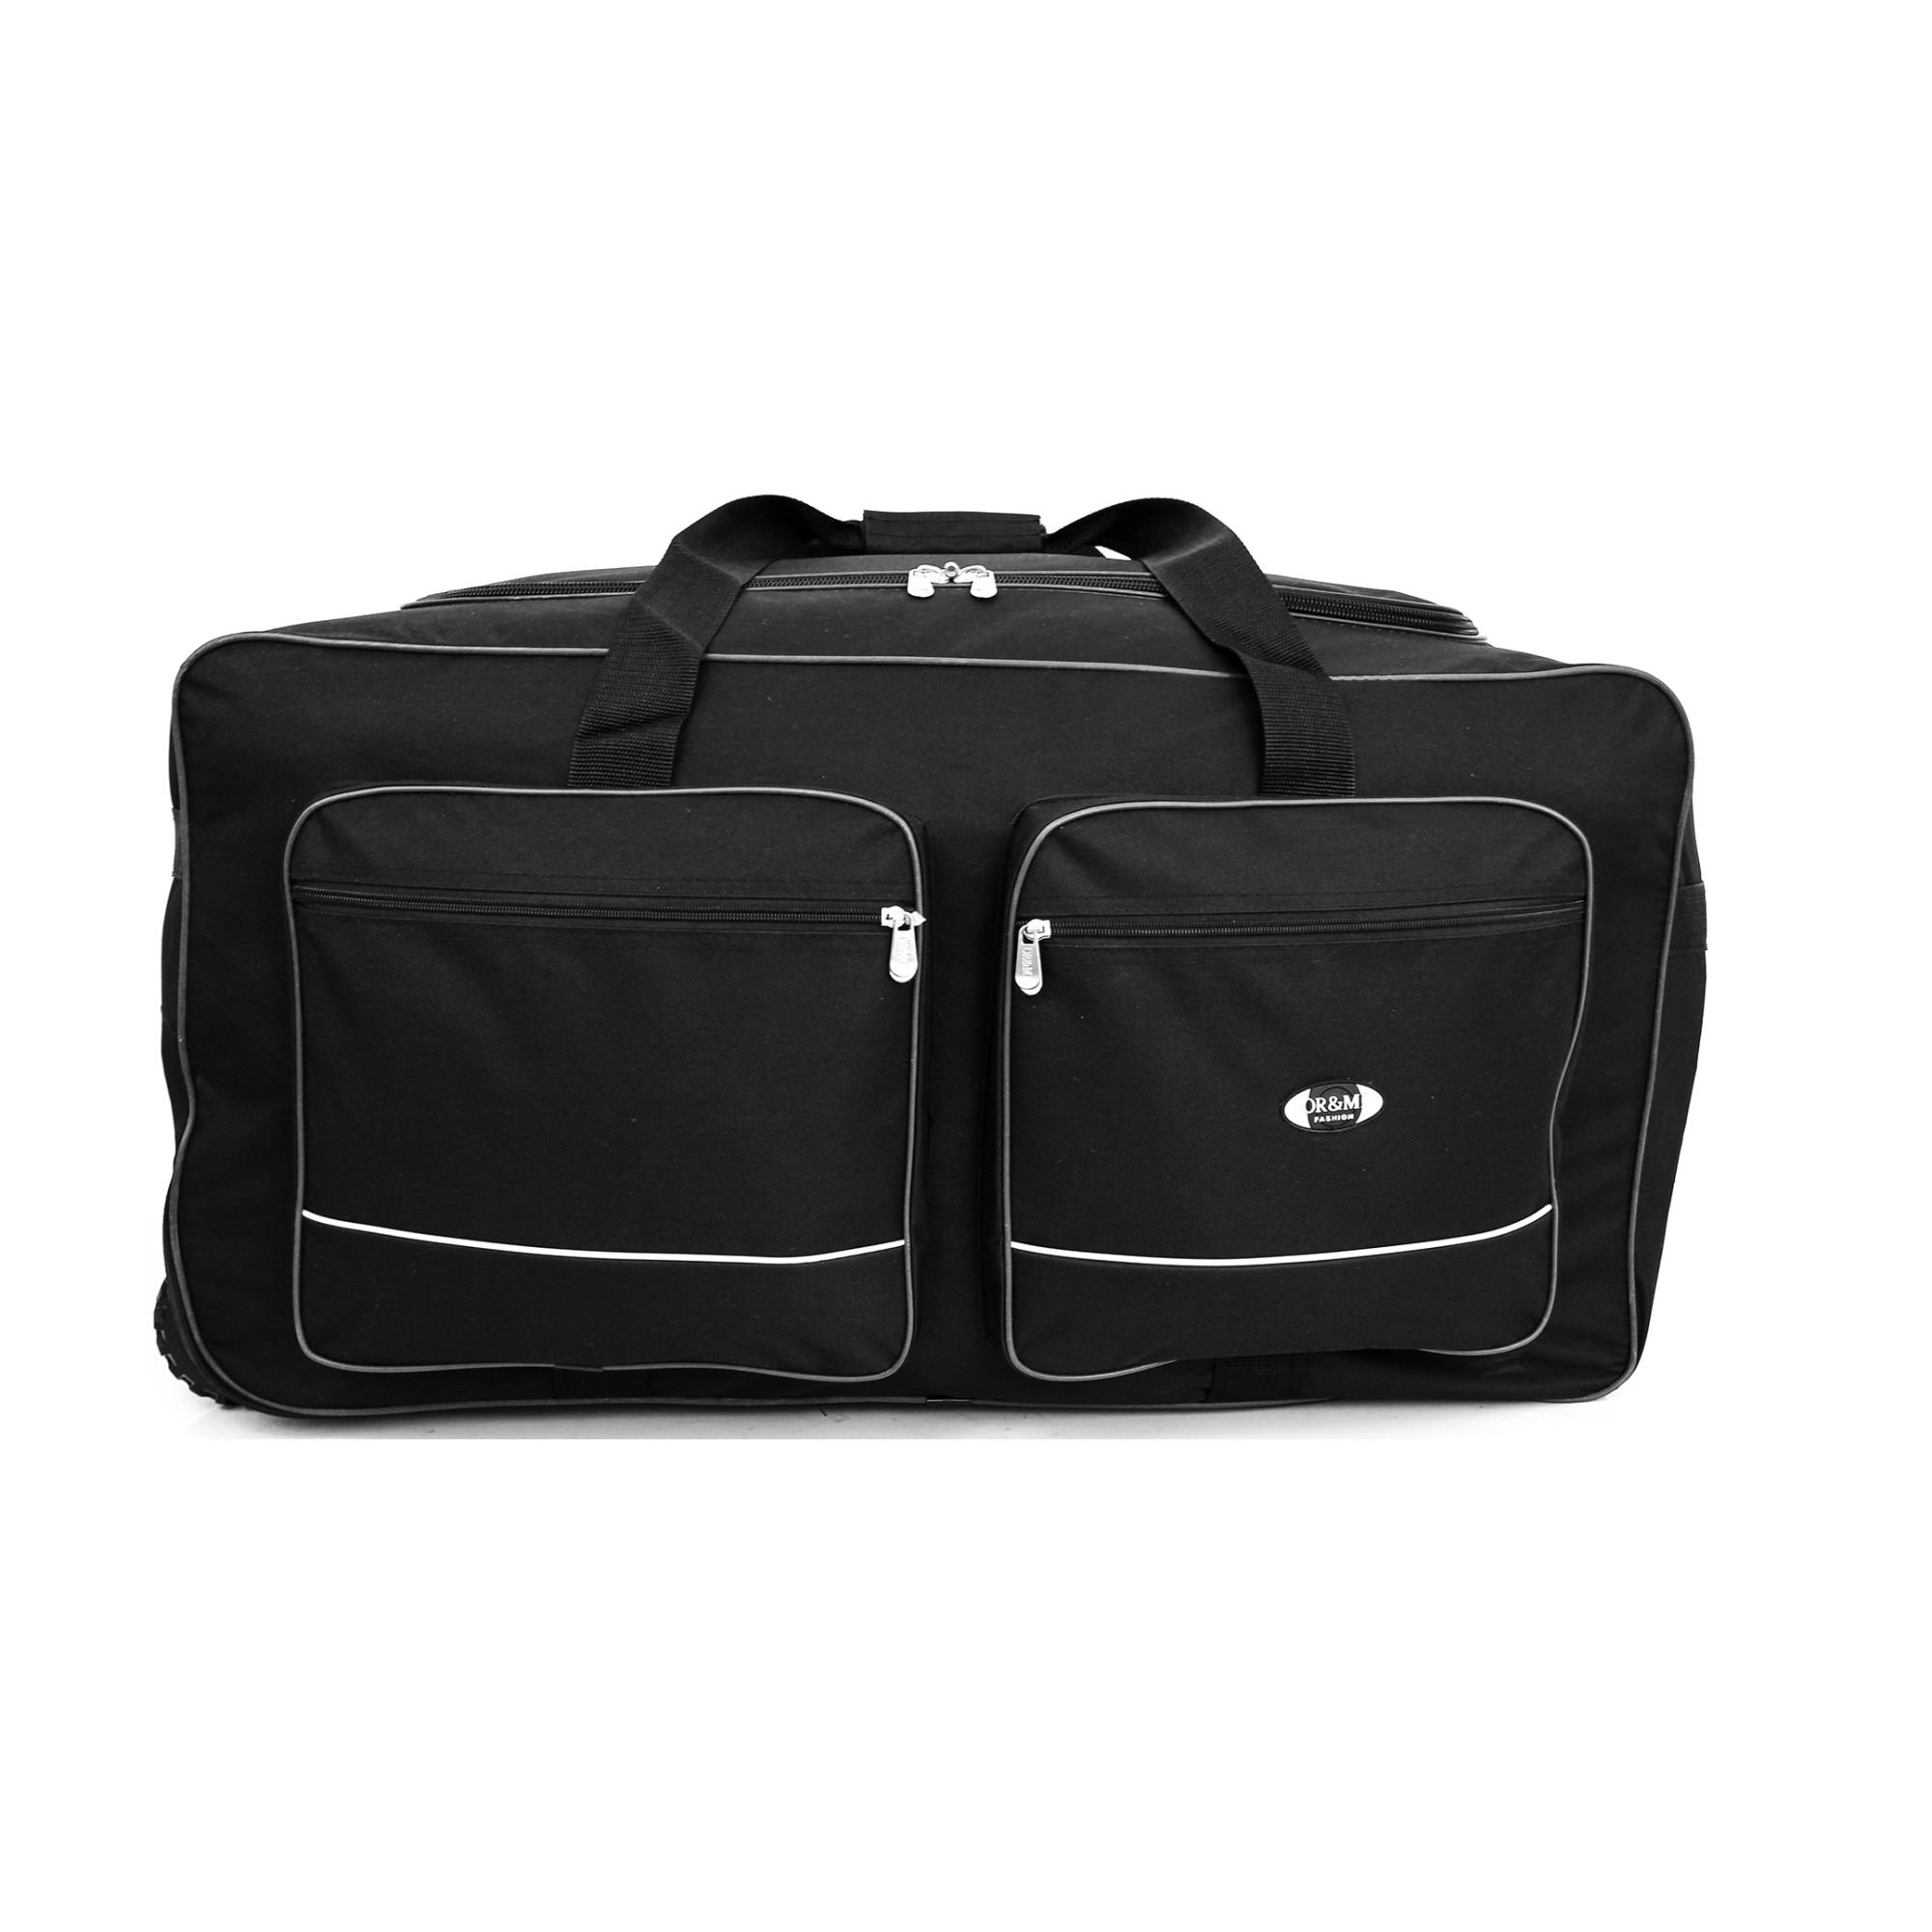 Mega duża torba podróżna na kółkach bagaż walizka 240 LITRÓW